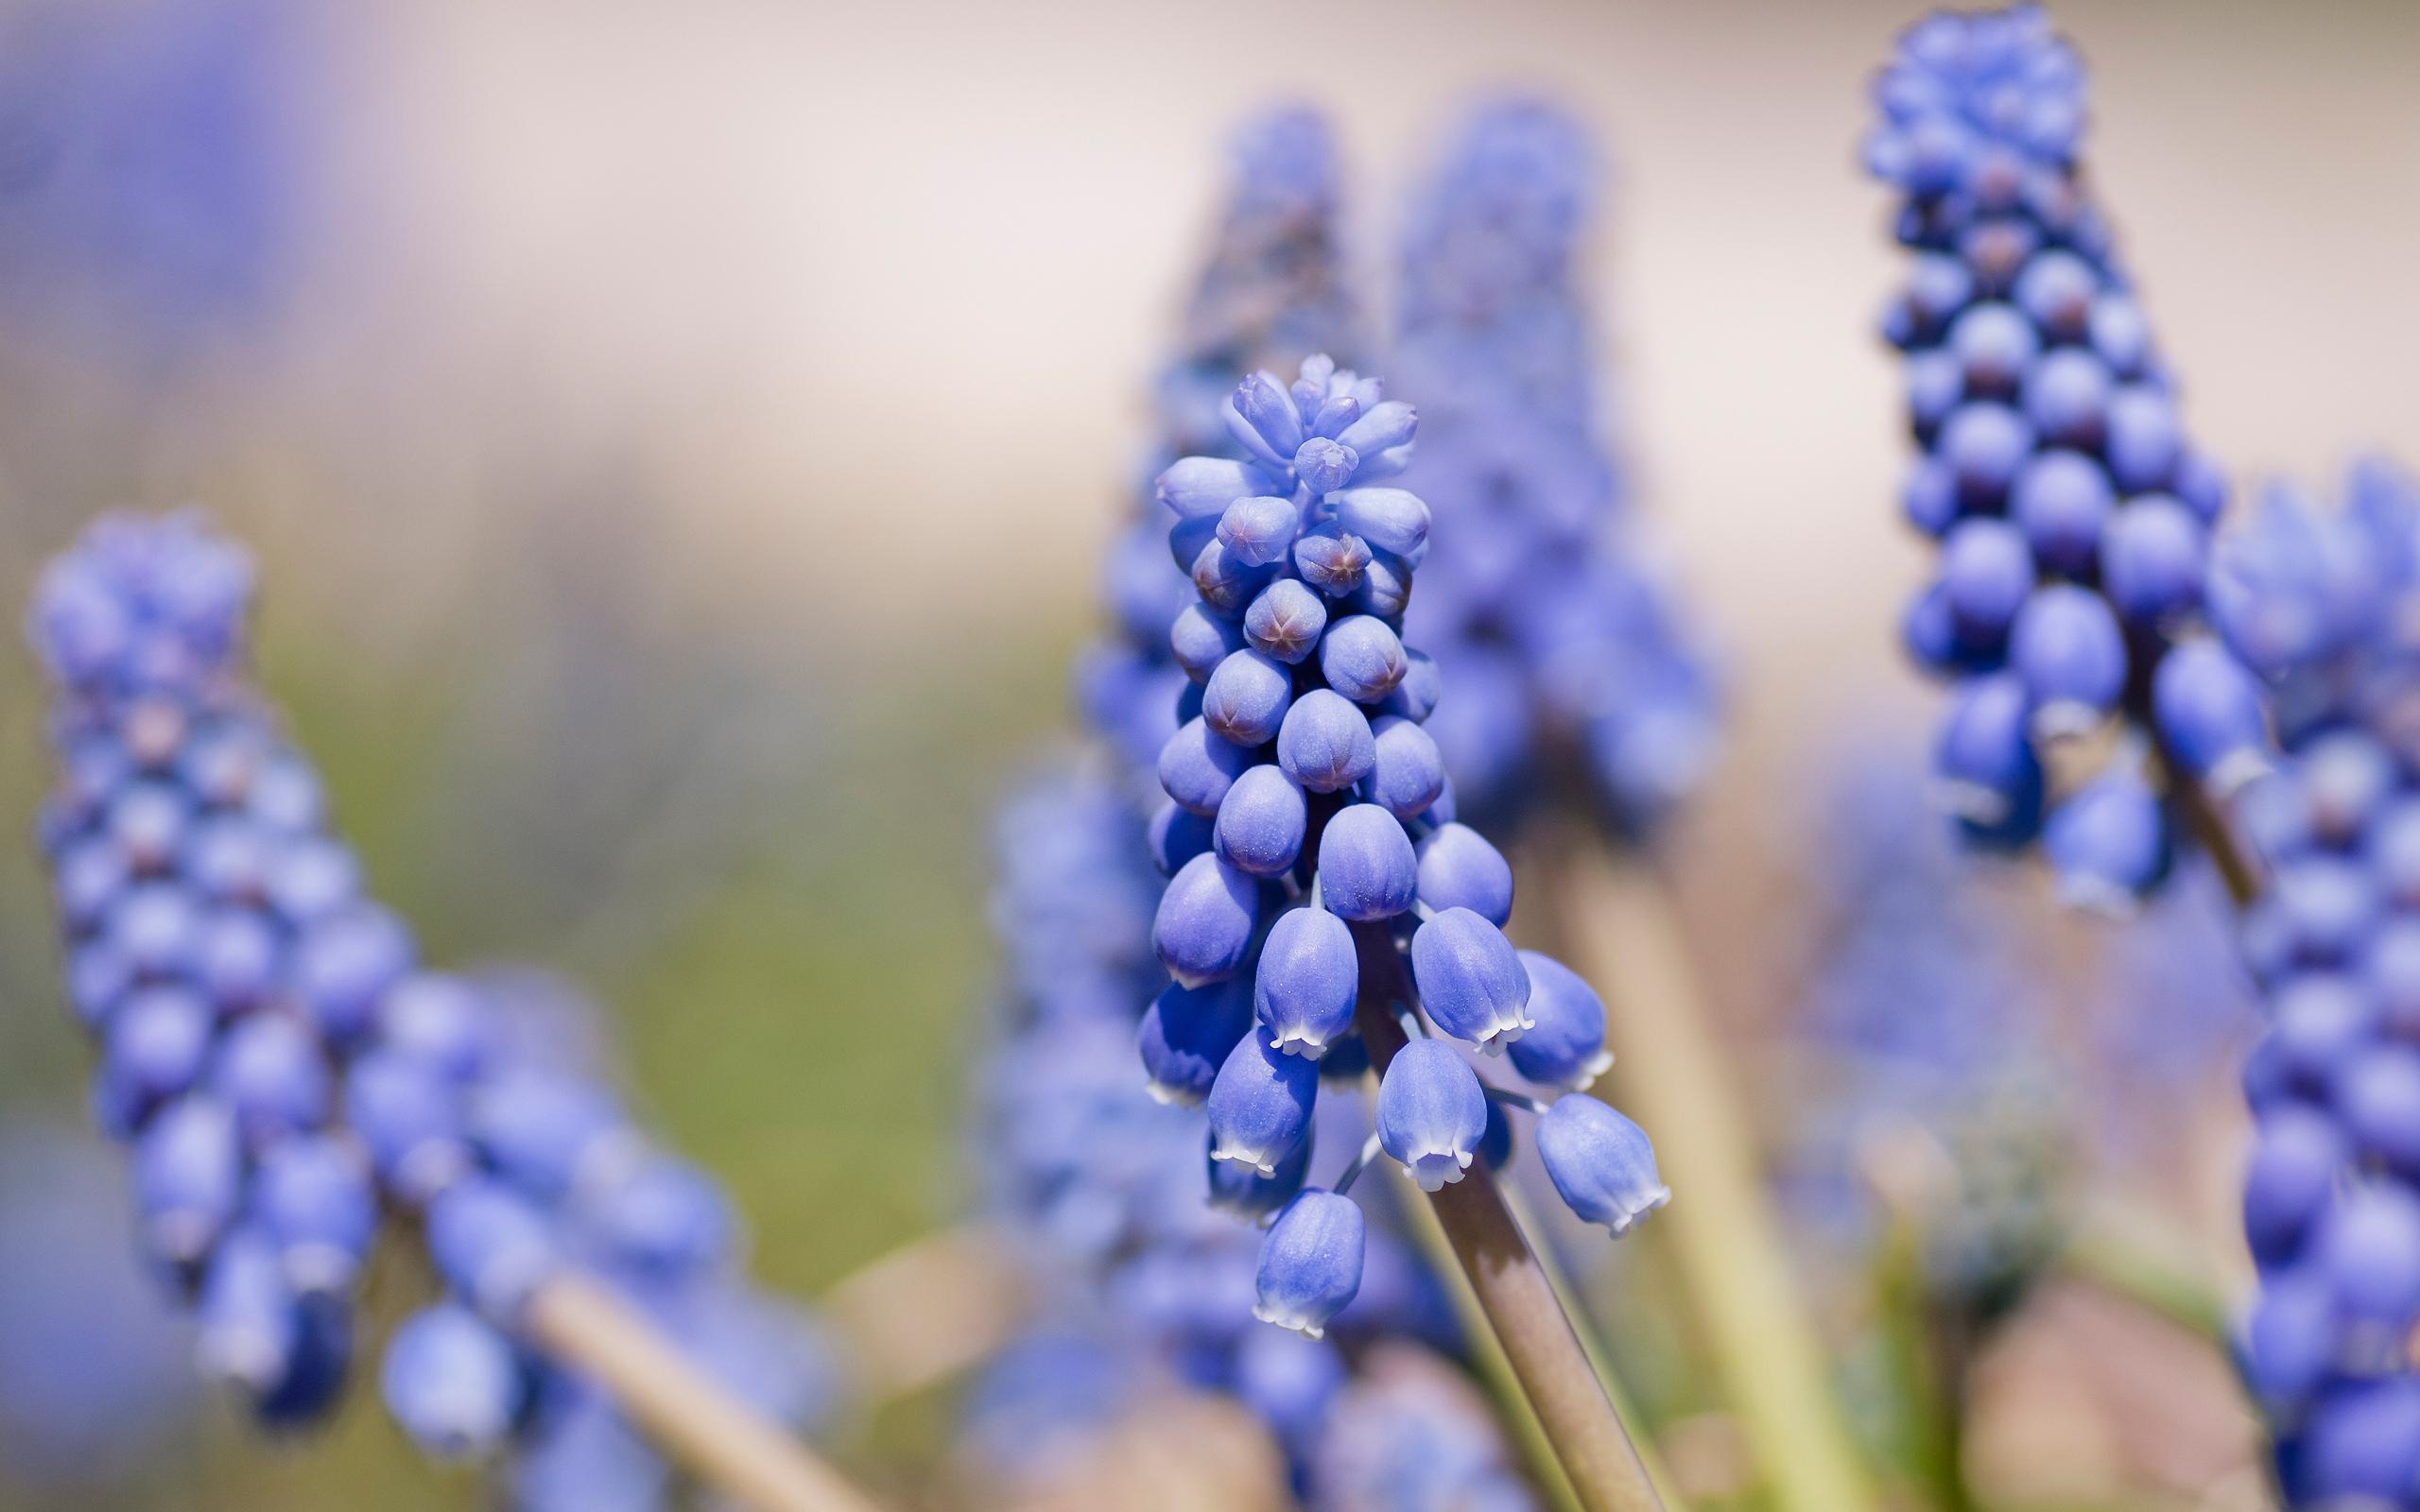 hyacinth blue flowers